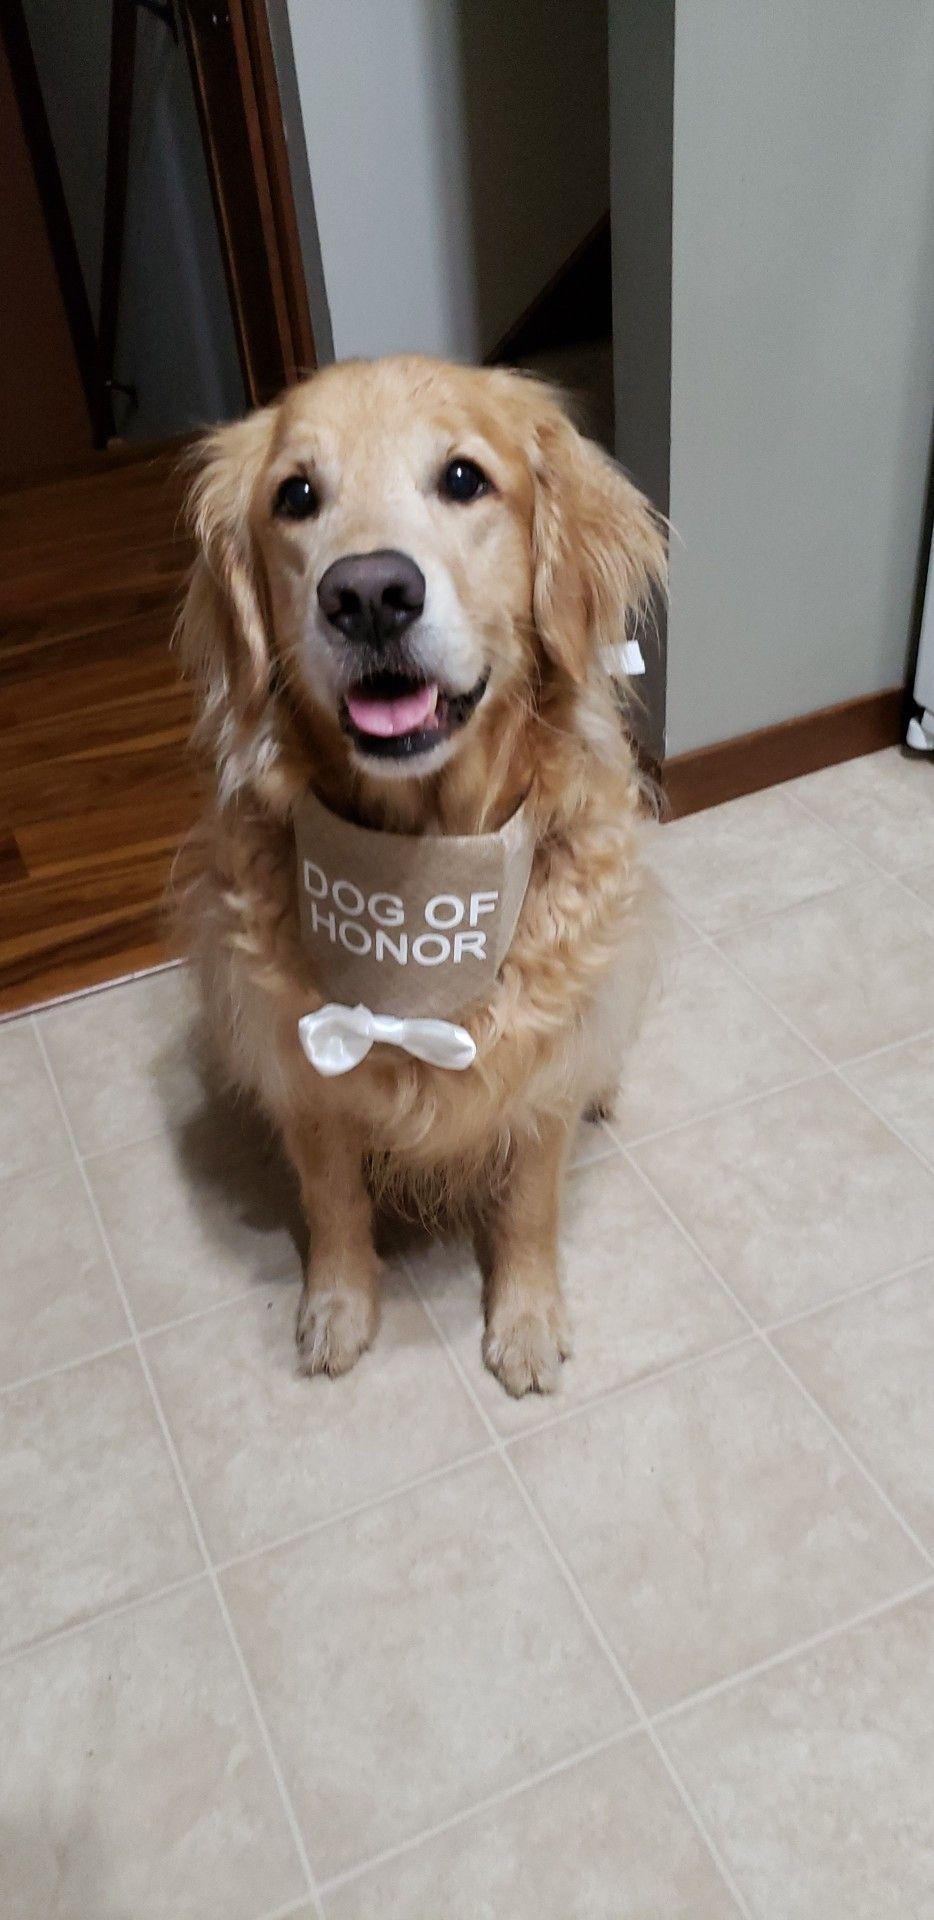 Dog of honor for our wedding Golden retriever, Dogs